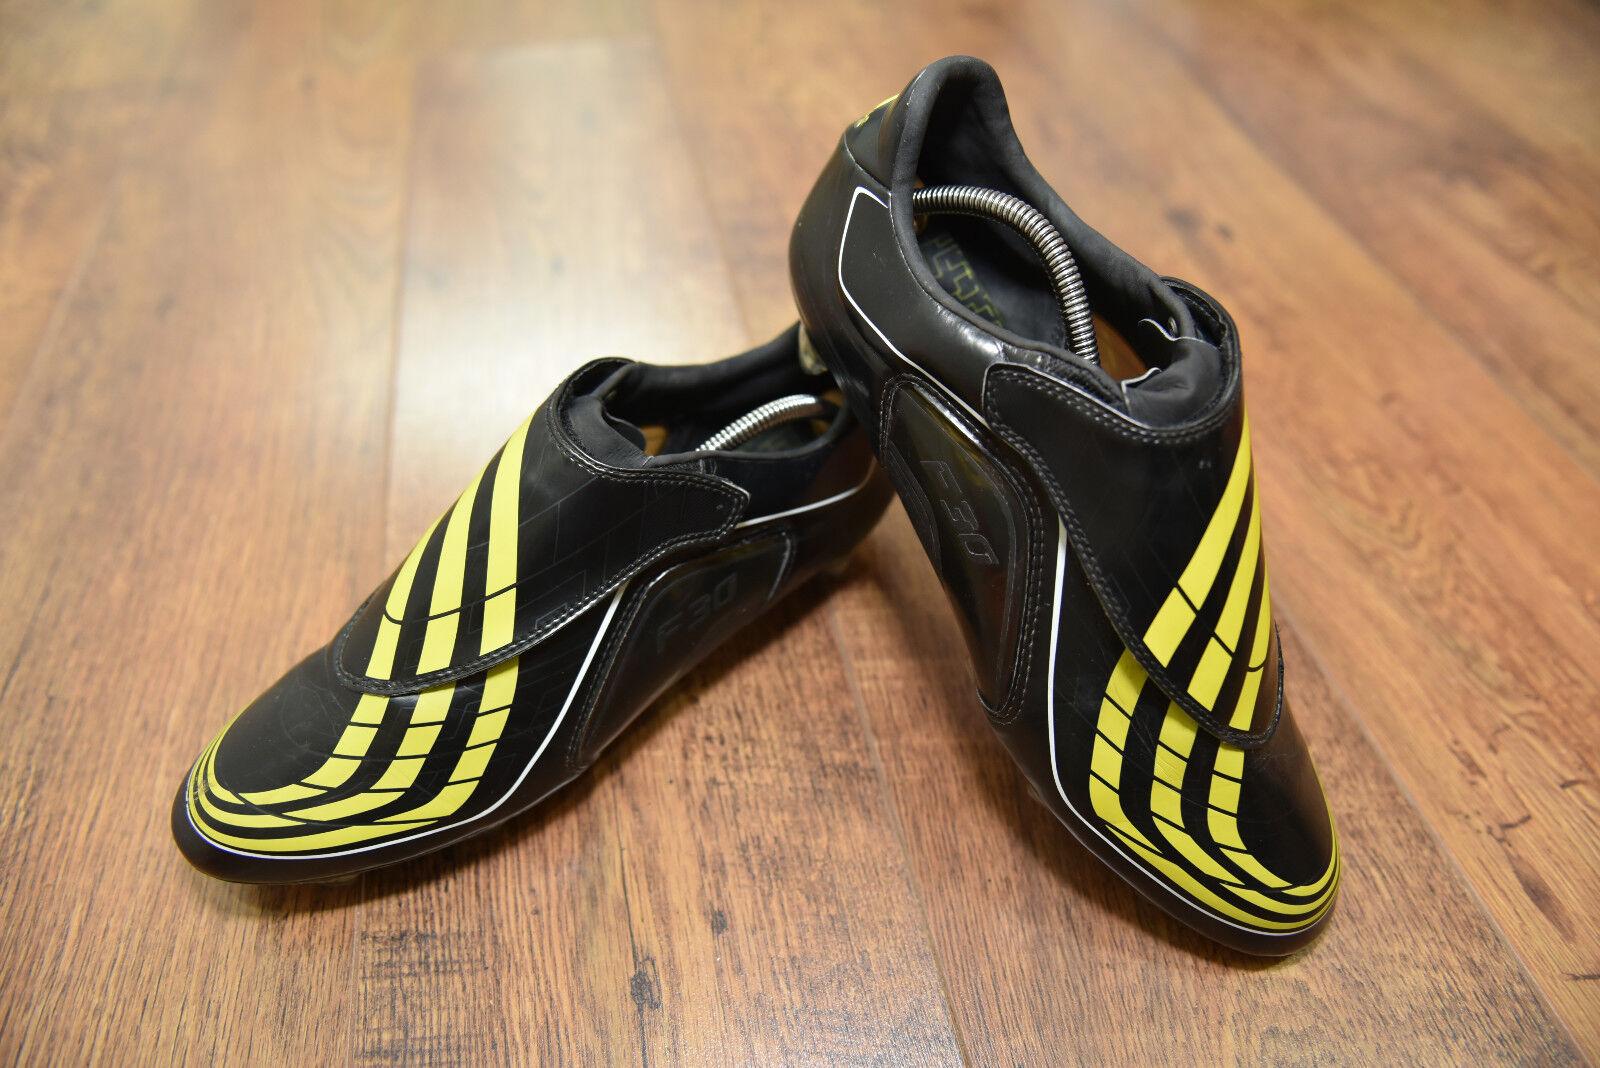 Adidas + F30 Tunit Trx Sg Fútbol botas raro no Mania